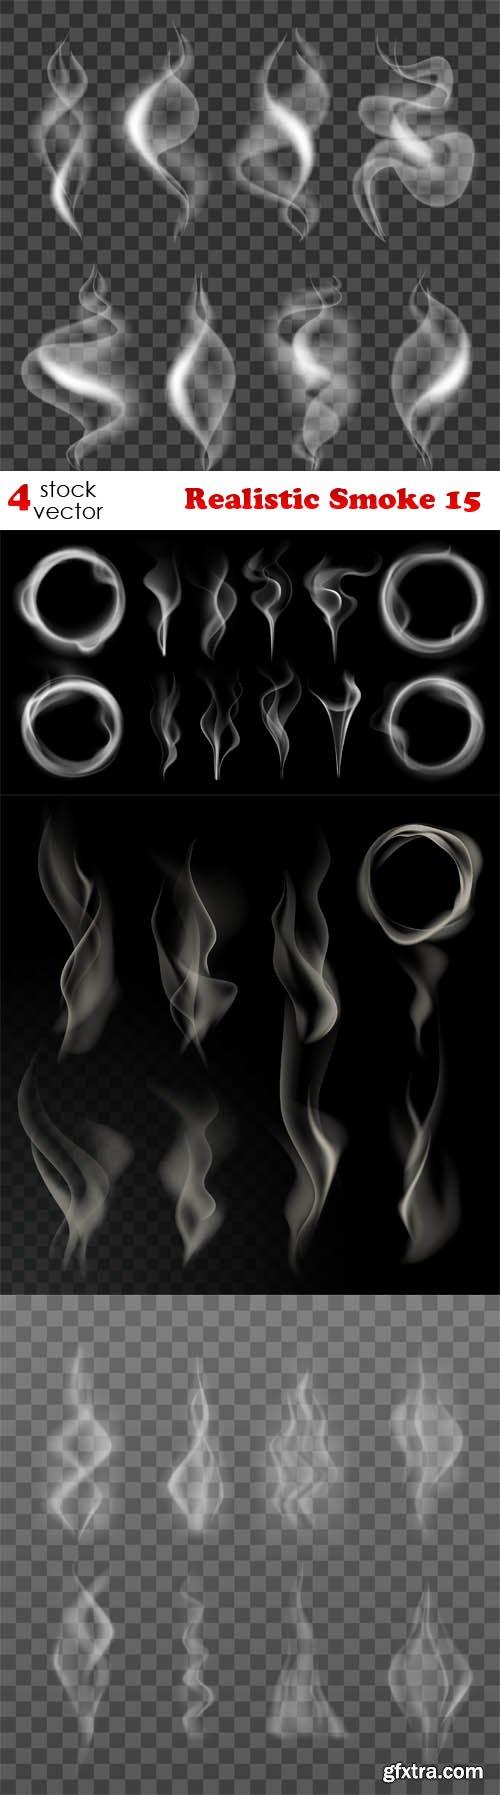 Vectors - Realistic Smoke 15